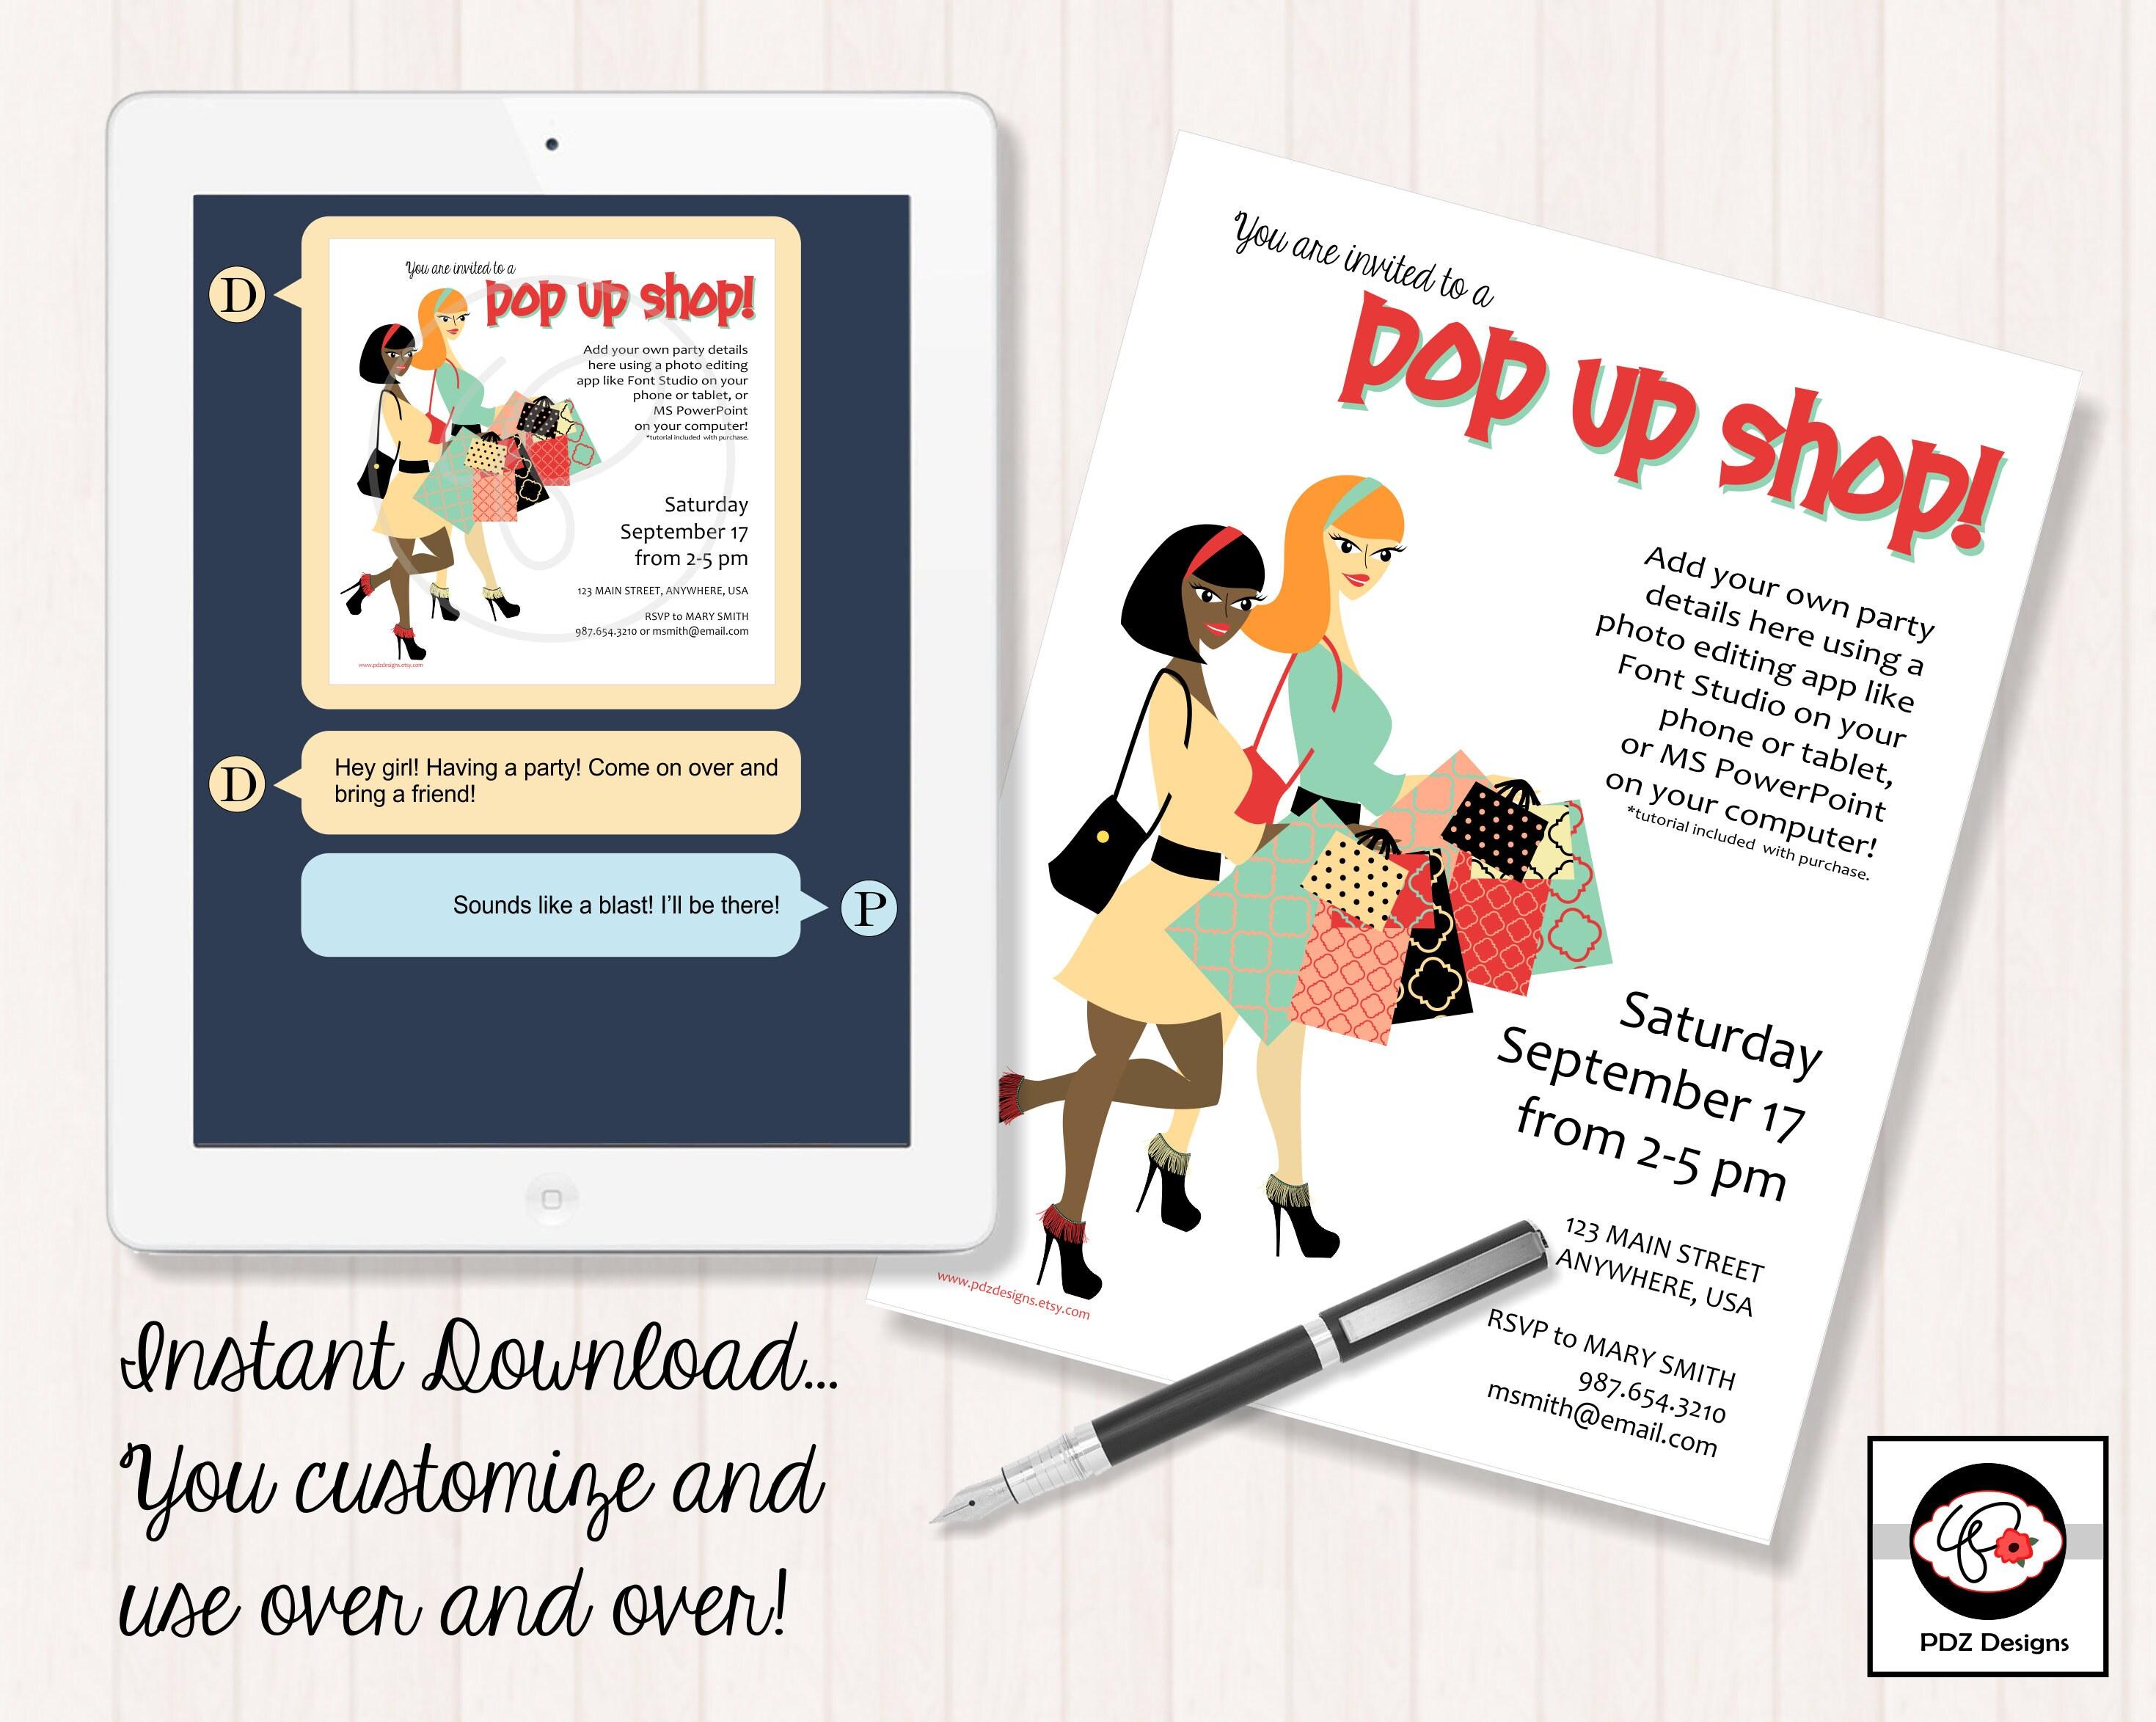 Pop up shop invitation business party invitation makeup zoom monicamarmolfo Gallery